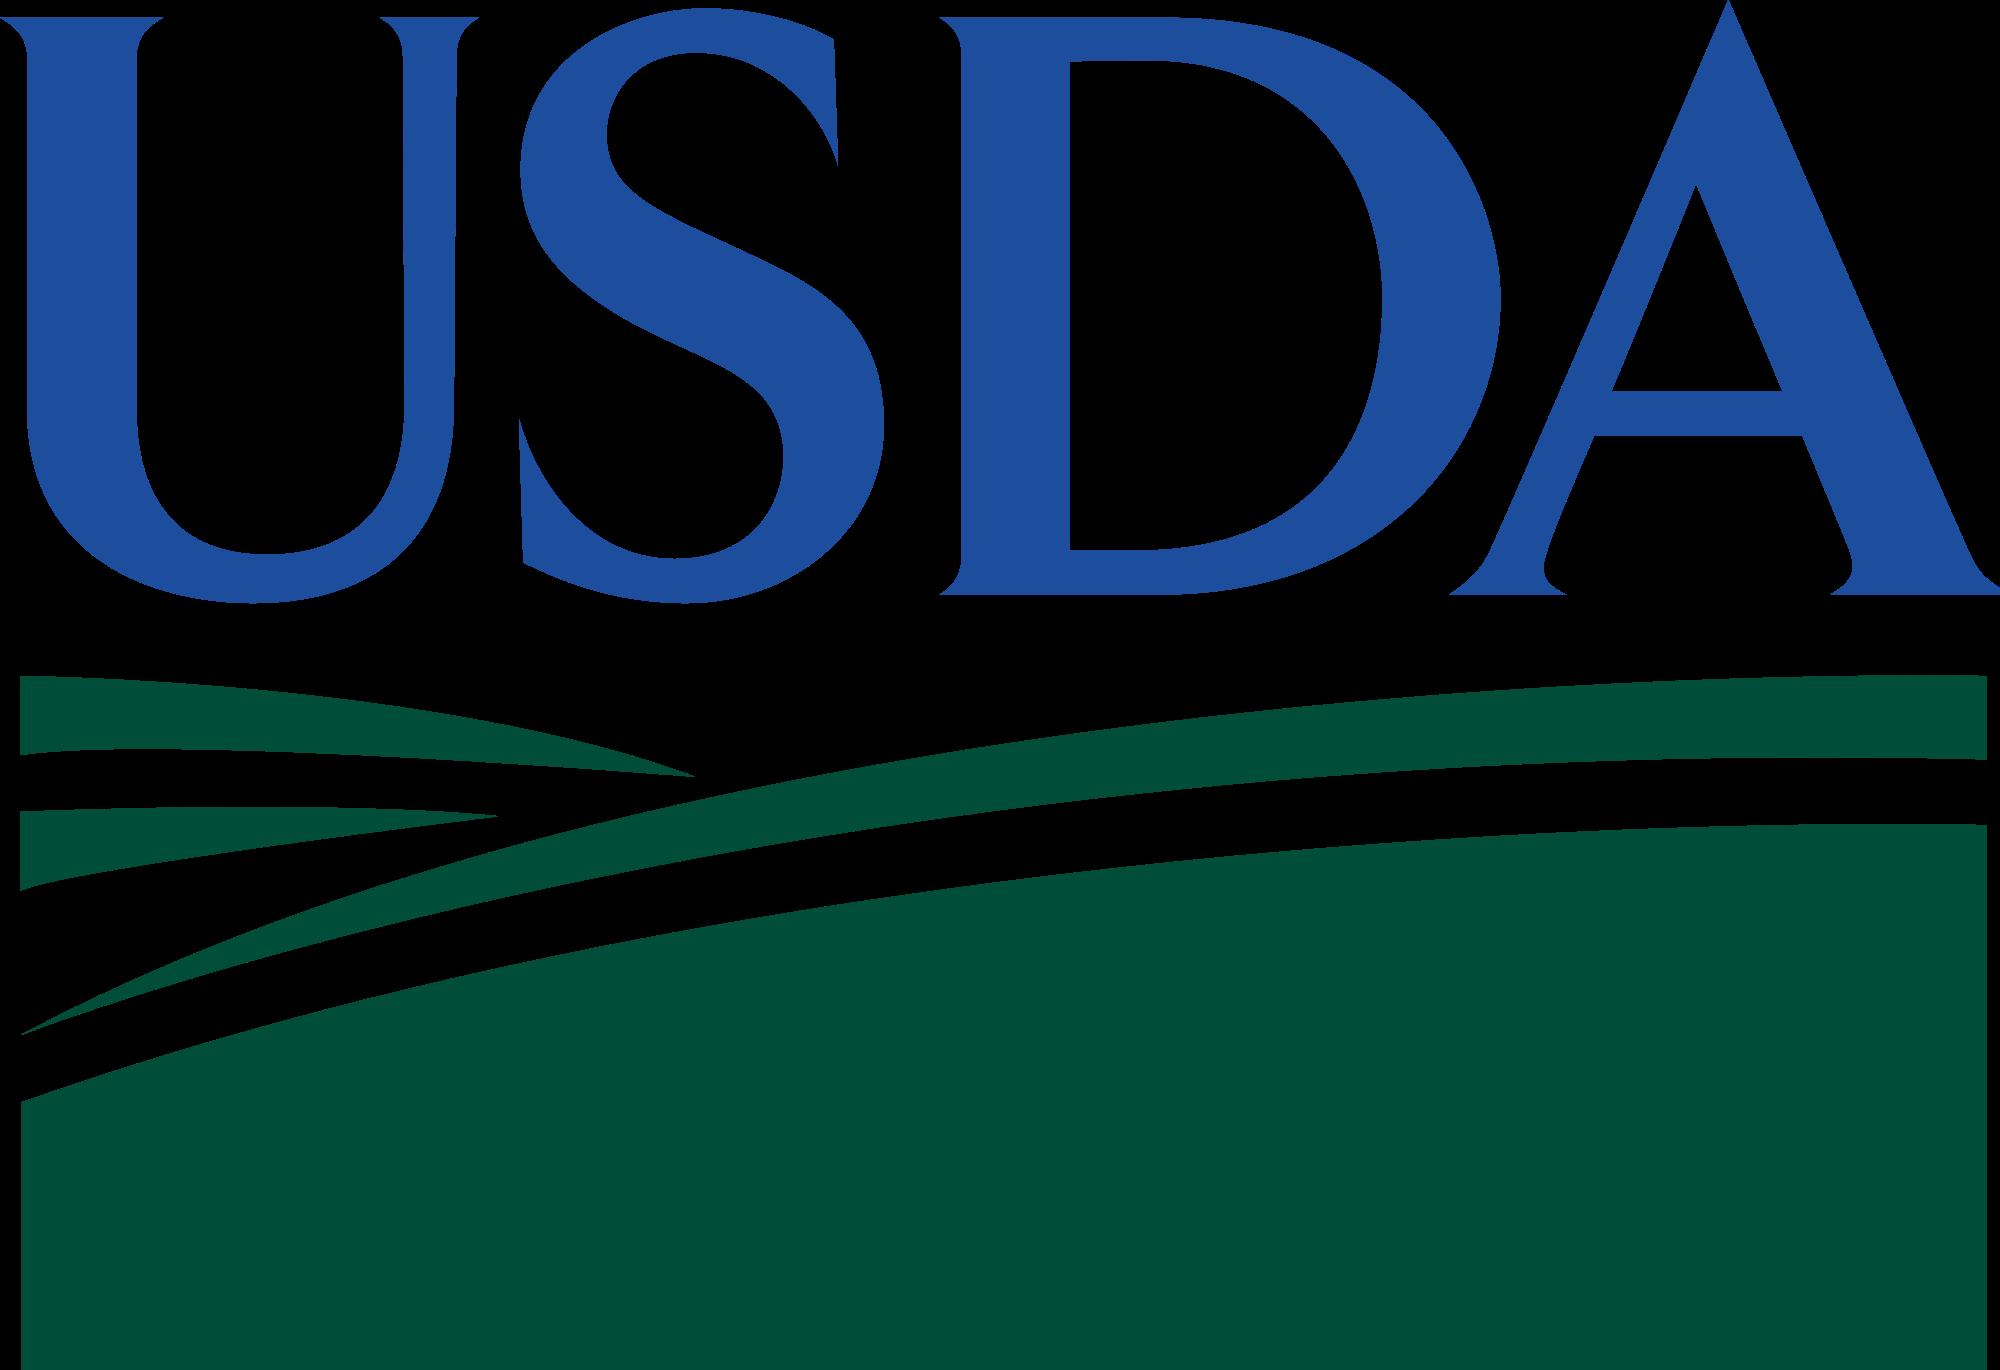 Usda Logo. Ajinomoto Hdpng.com  - Ajinomoto Vector, Transparent background PNG HD thumbnail